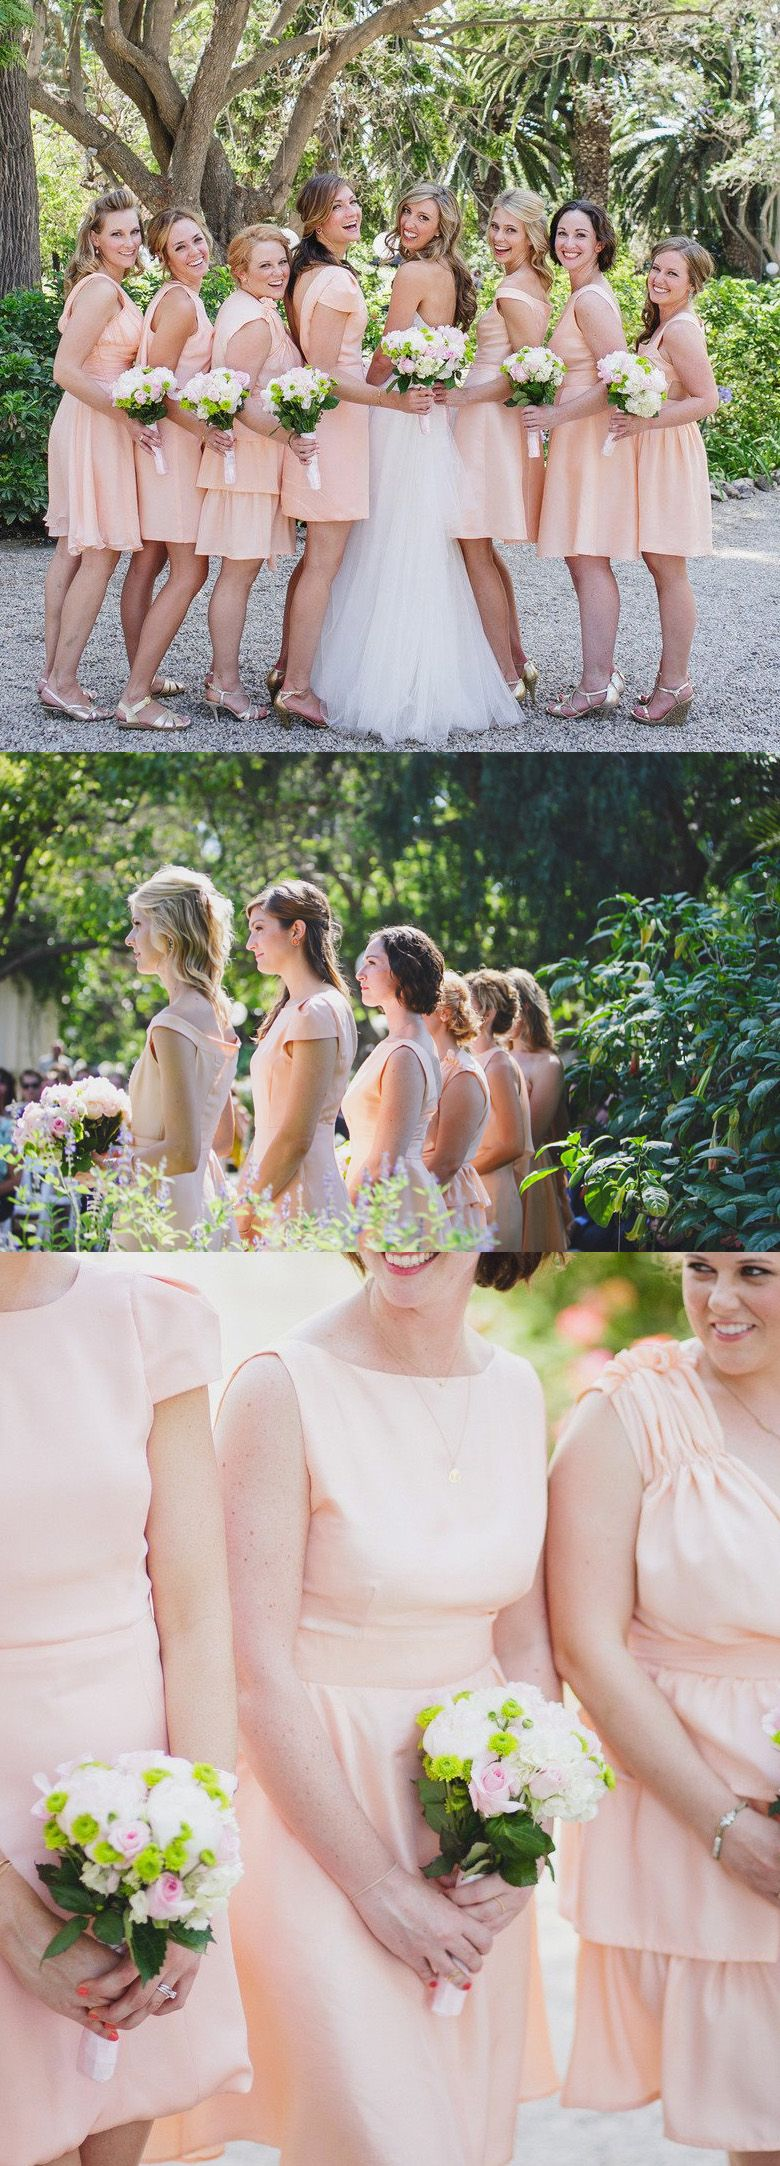 Discount Mini Bridesmaid Dress Short Pink Dresses With Zipper Layered Bateau Fine Bridesmaid Dresses Wf02g54 809 Brautjungfernkleider Lang Brautjungfernkleider Blau Brautjungfernkleider